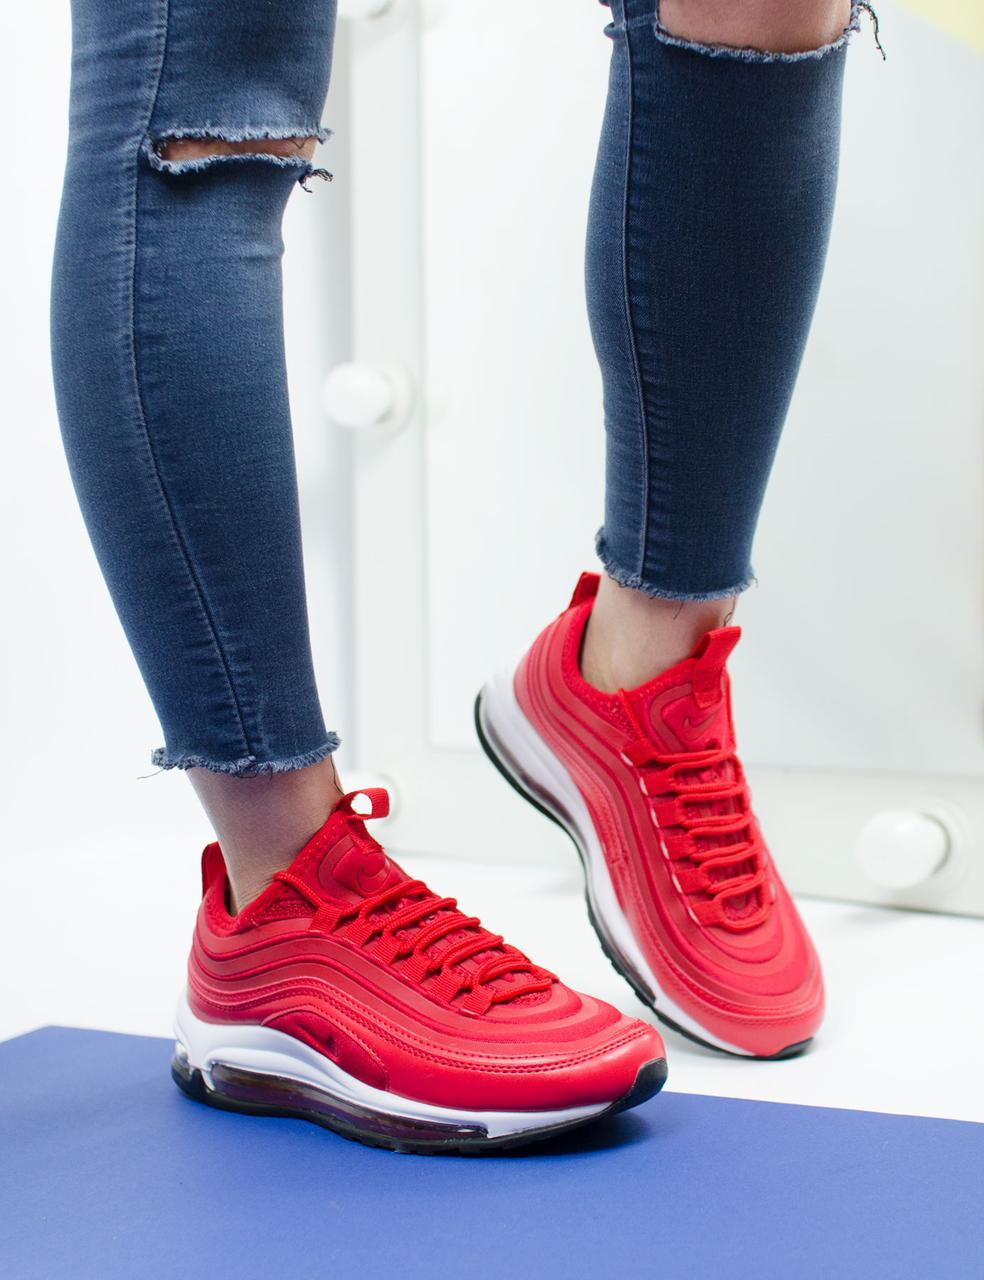 Женские кроссовки Nike Air Max 97 Red (36, 37, 38, 39, 40 размеры)